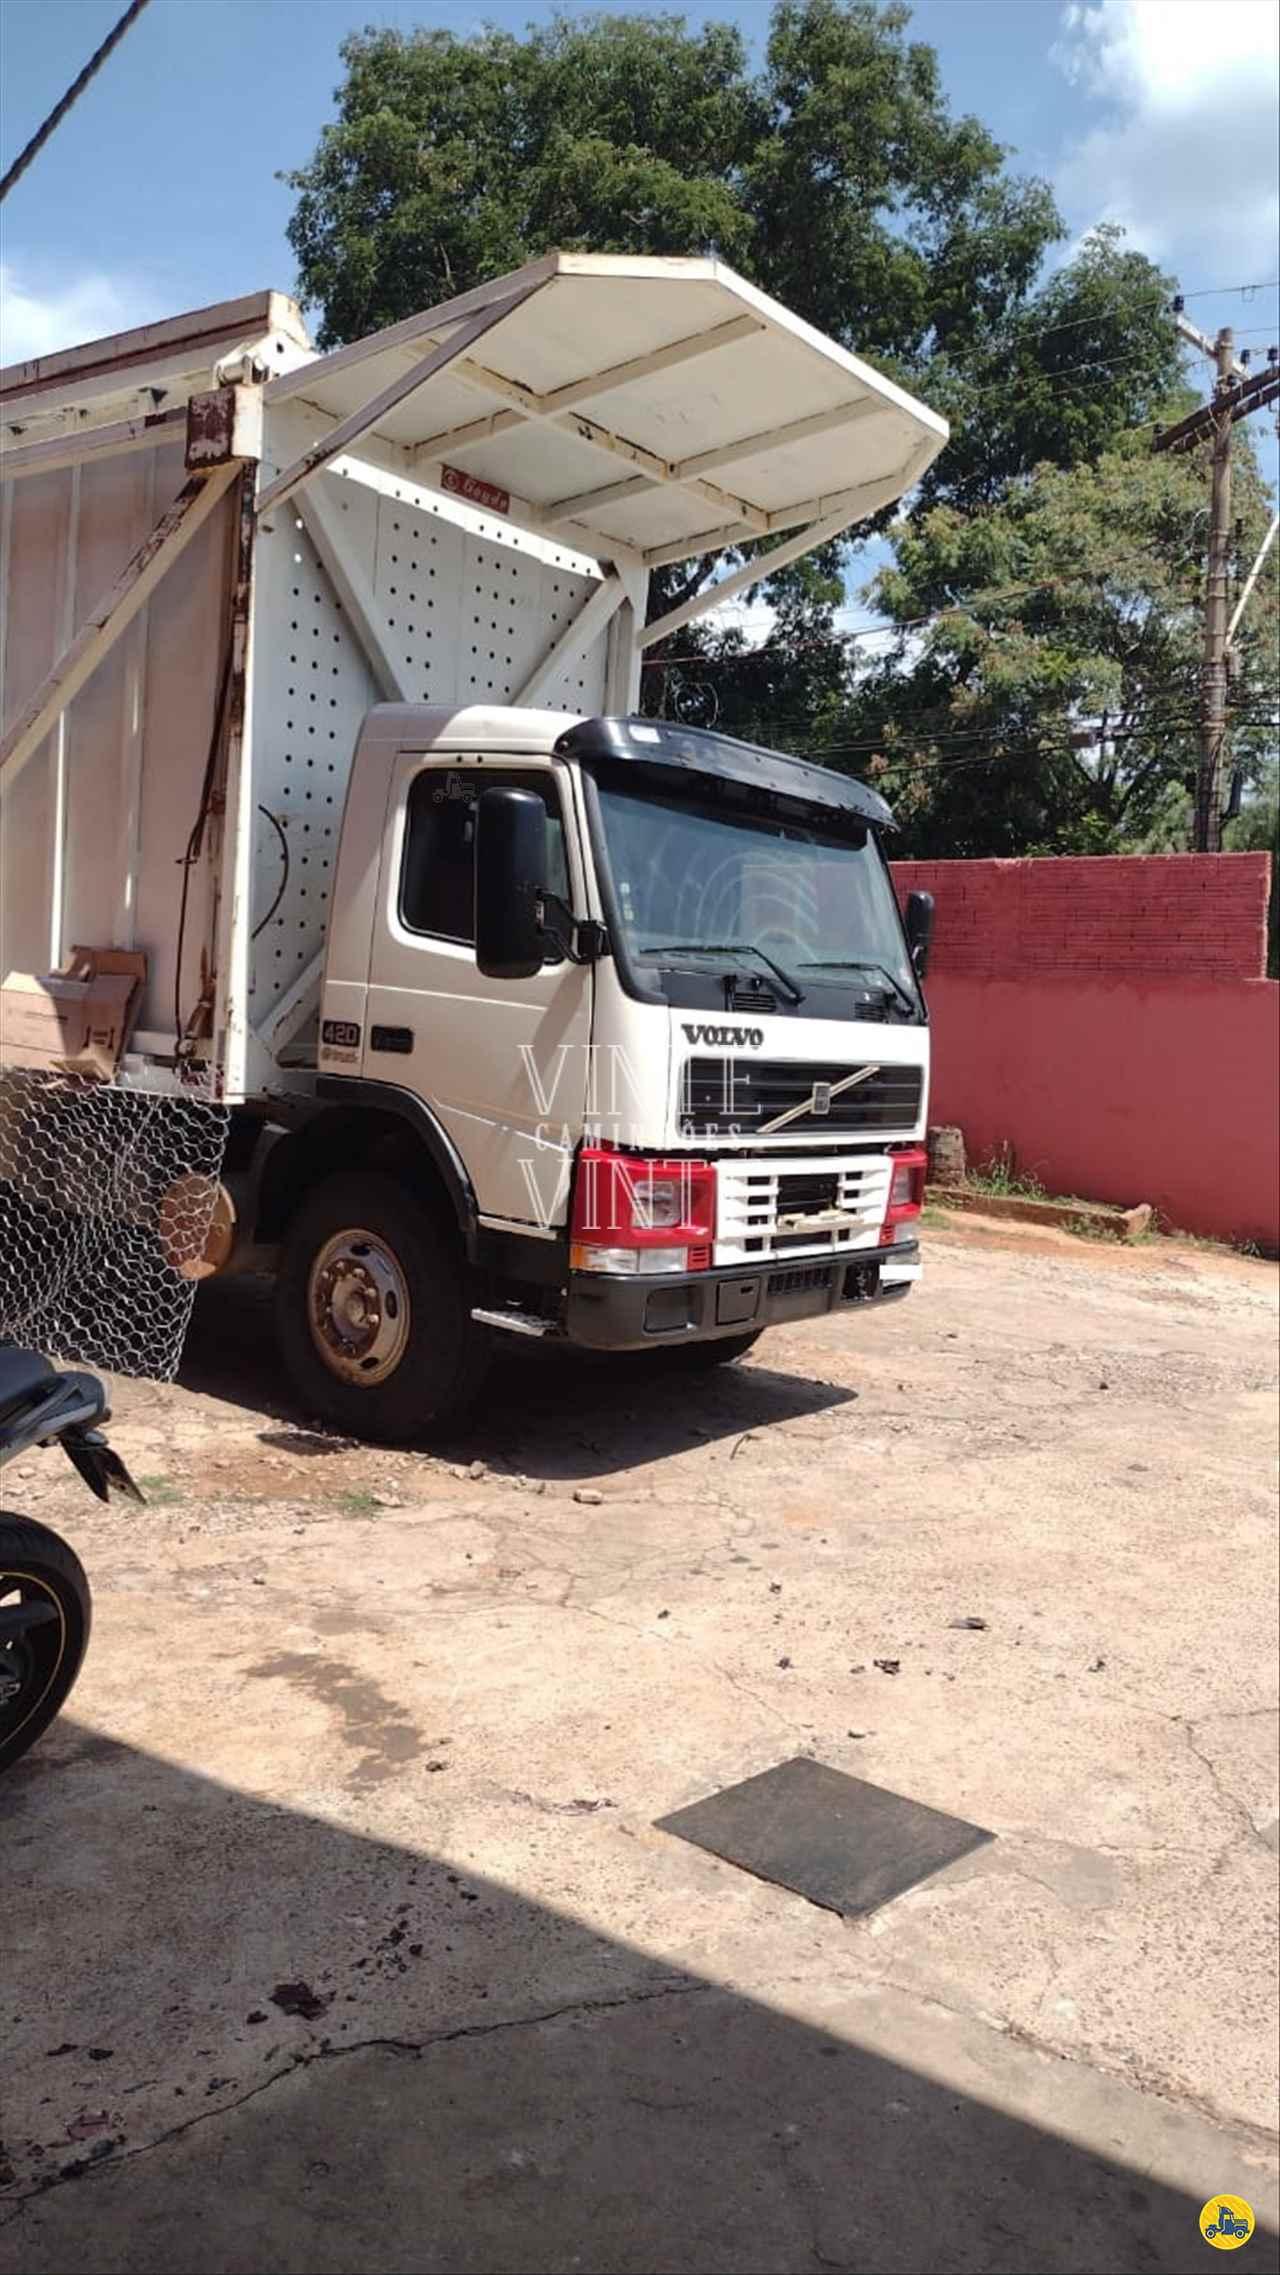 VOLVO FM12 420 de Vinte-Vinte Caminhões - SANTO ANDRE/SP